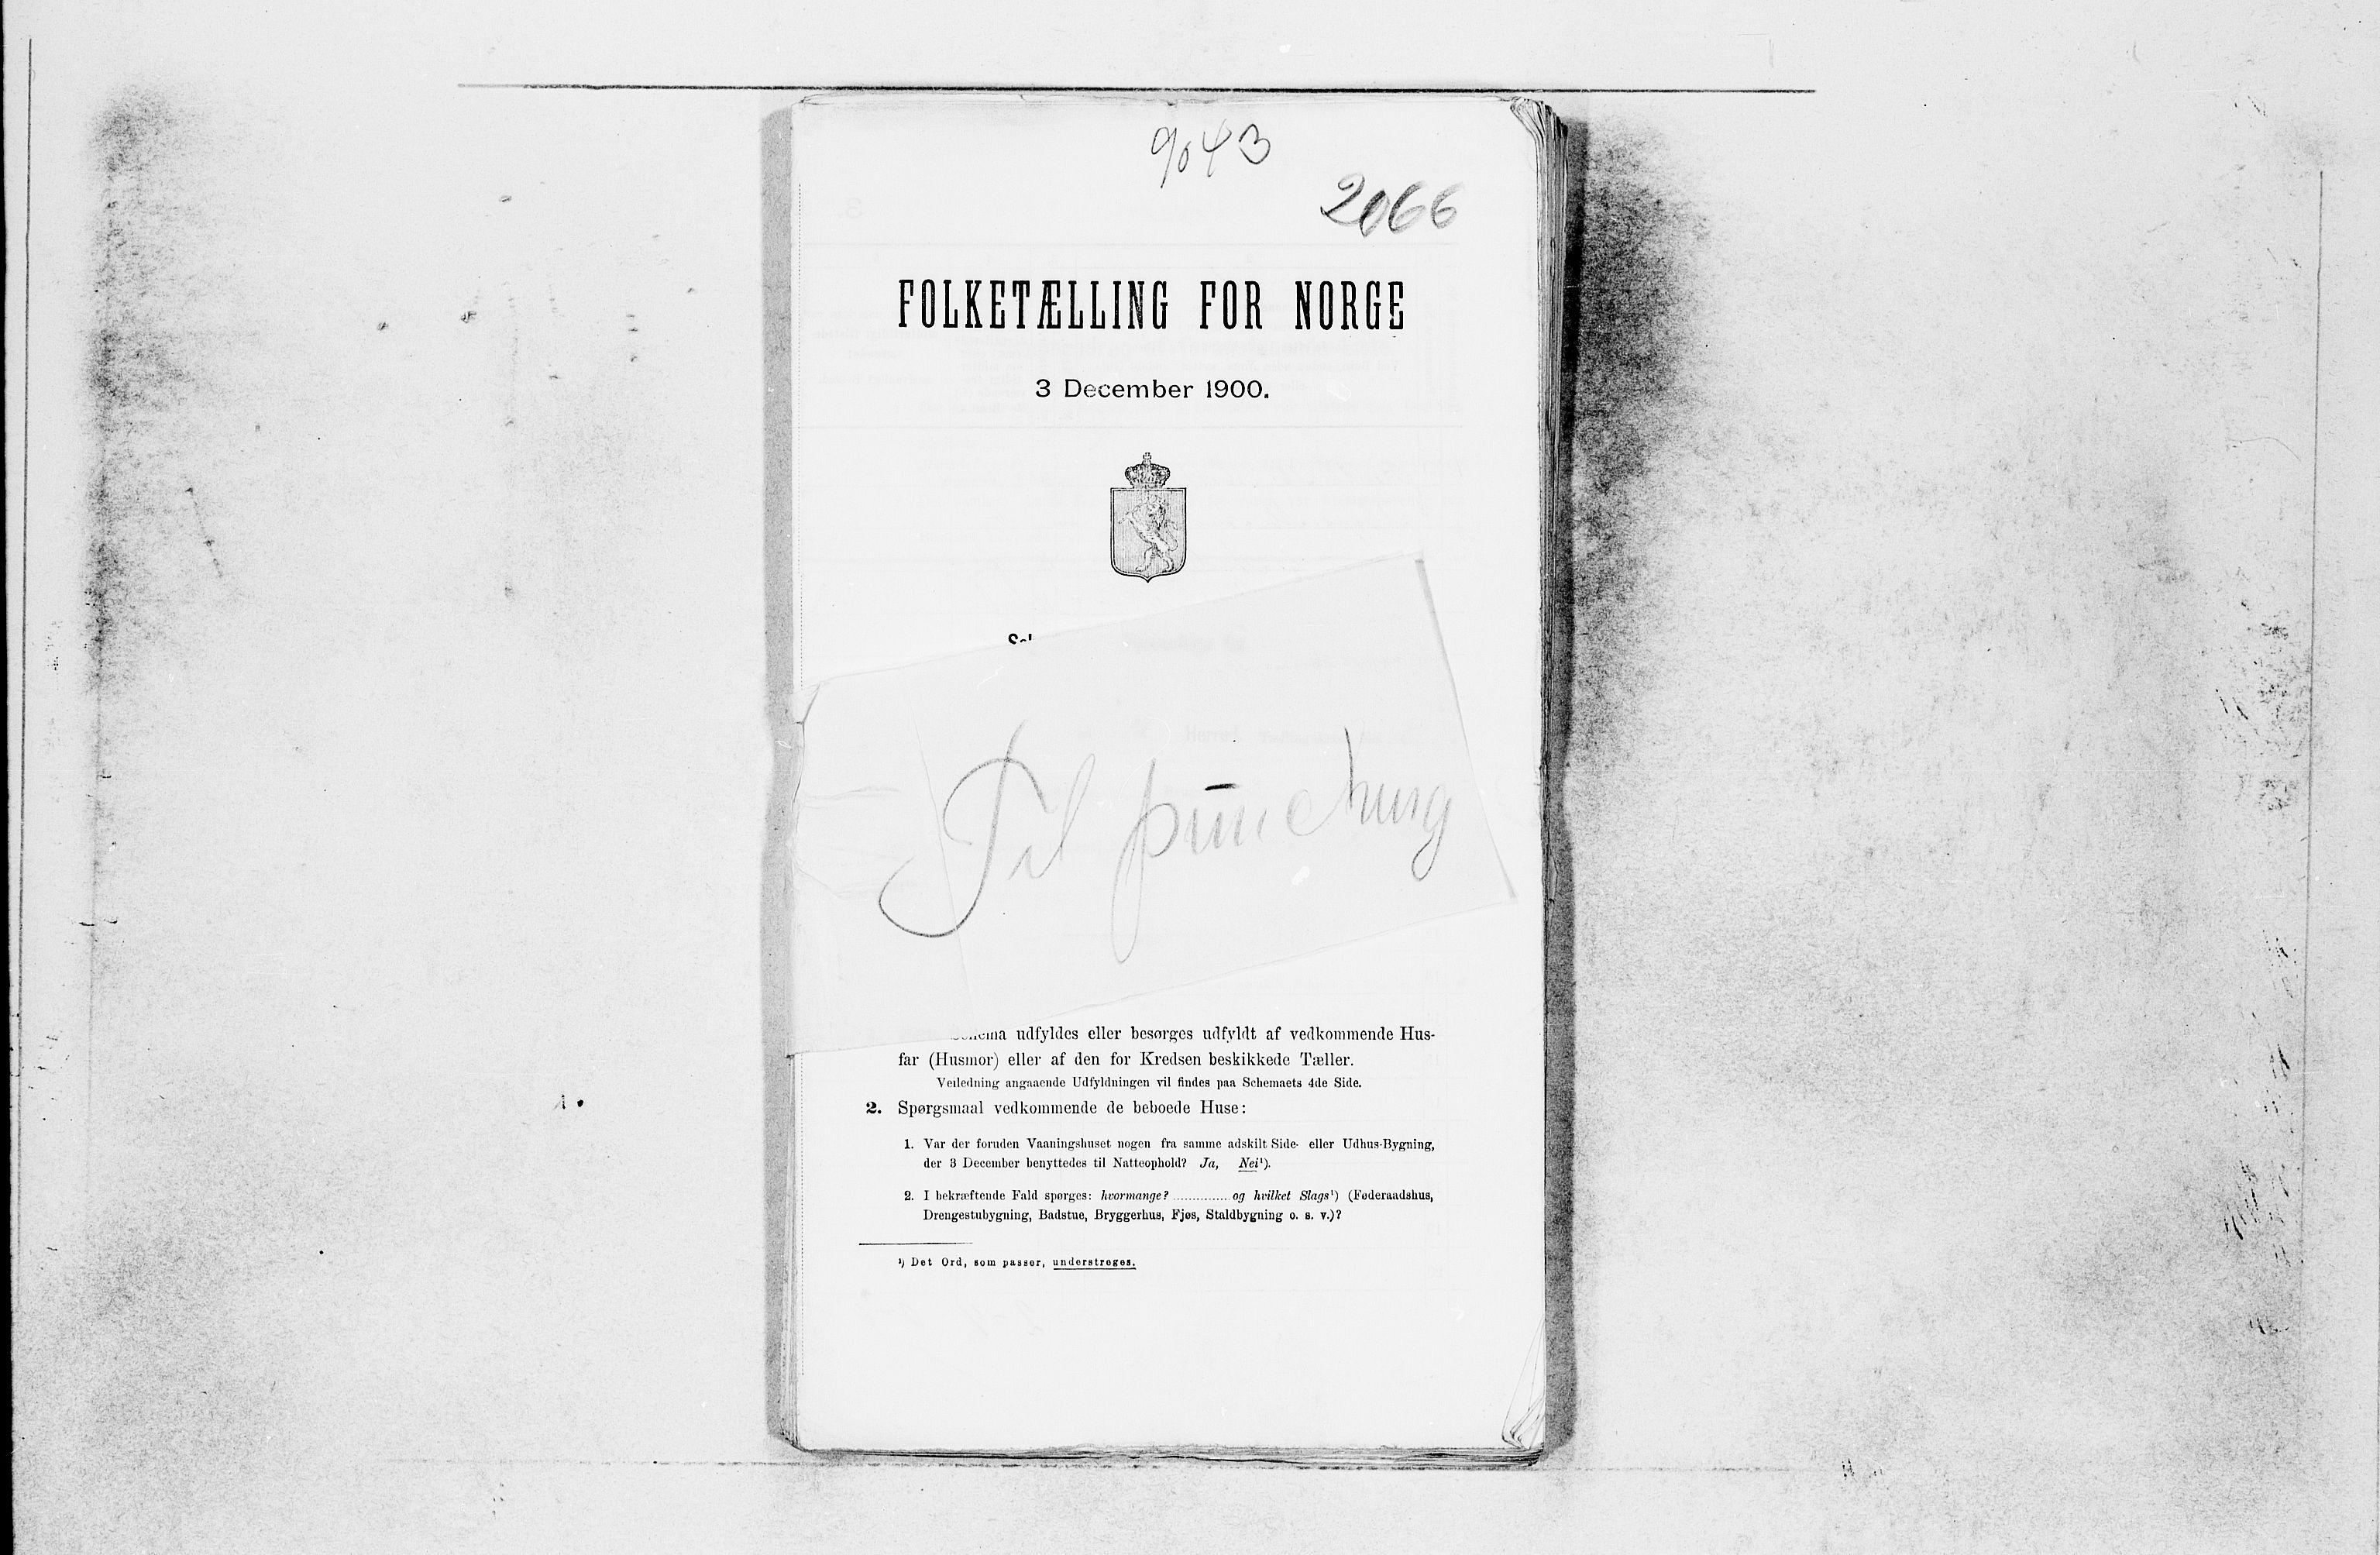 SAB, Folketelling 1900 for 1246 Fjell herred, 1900, s. 21